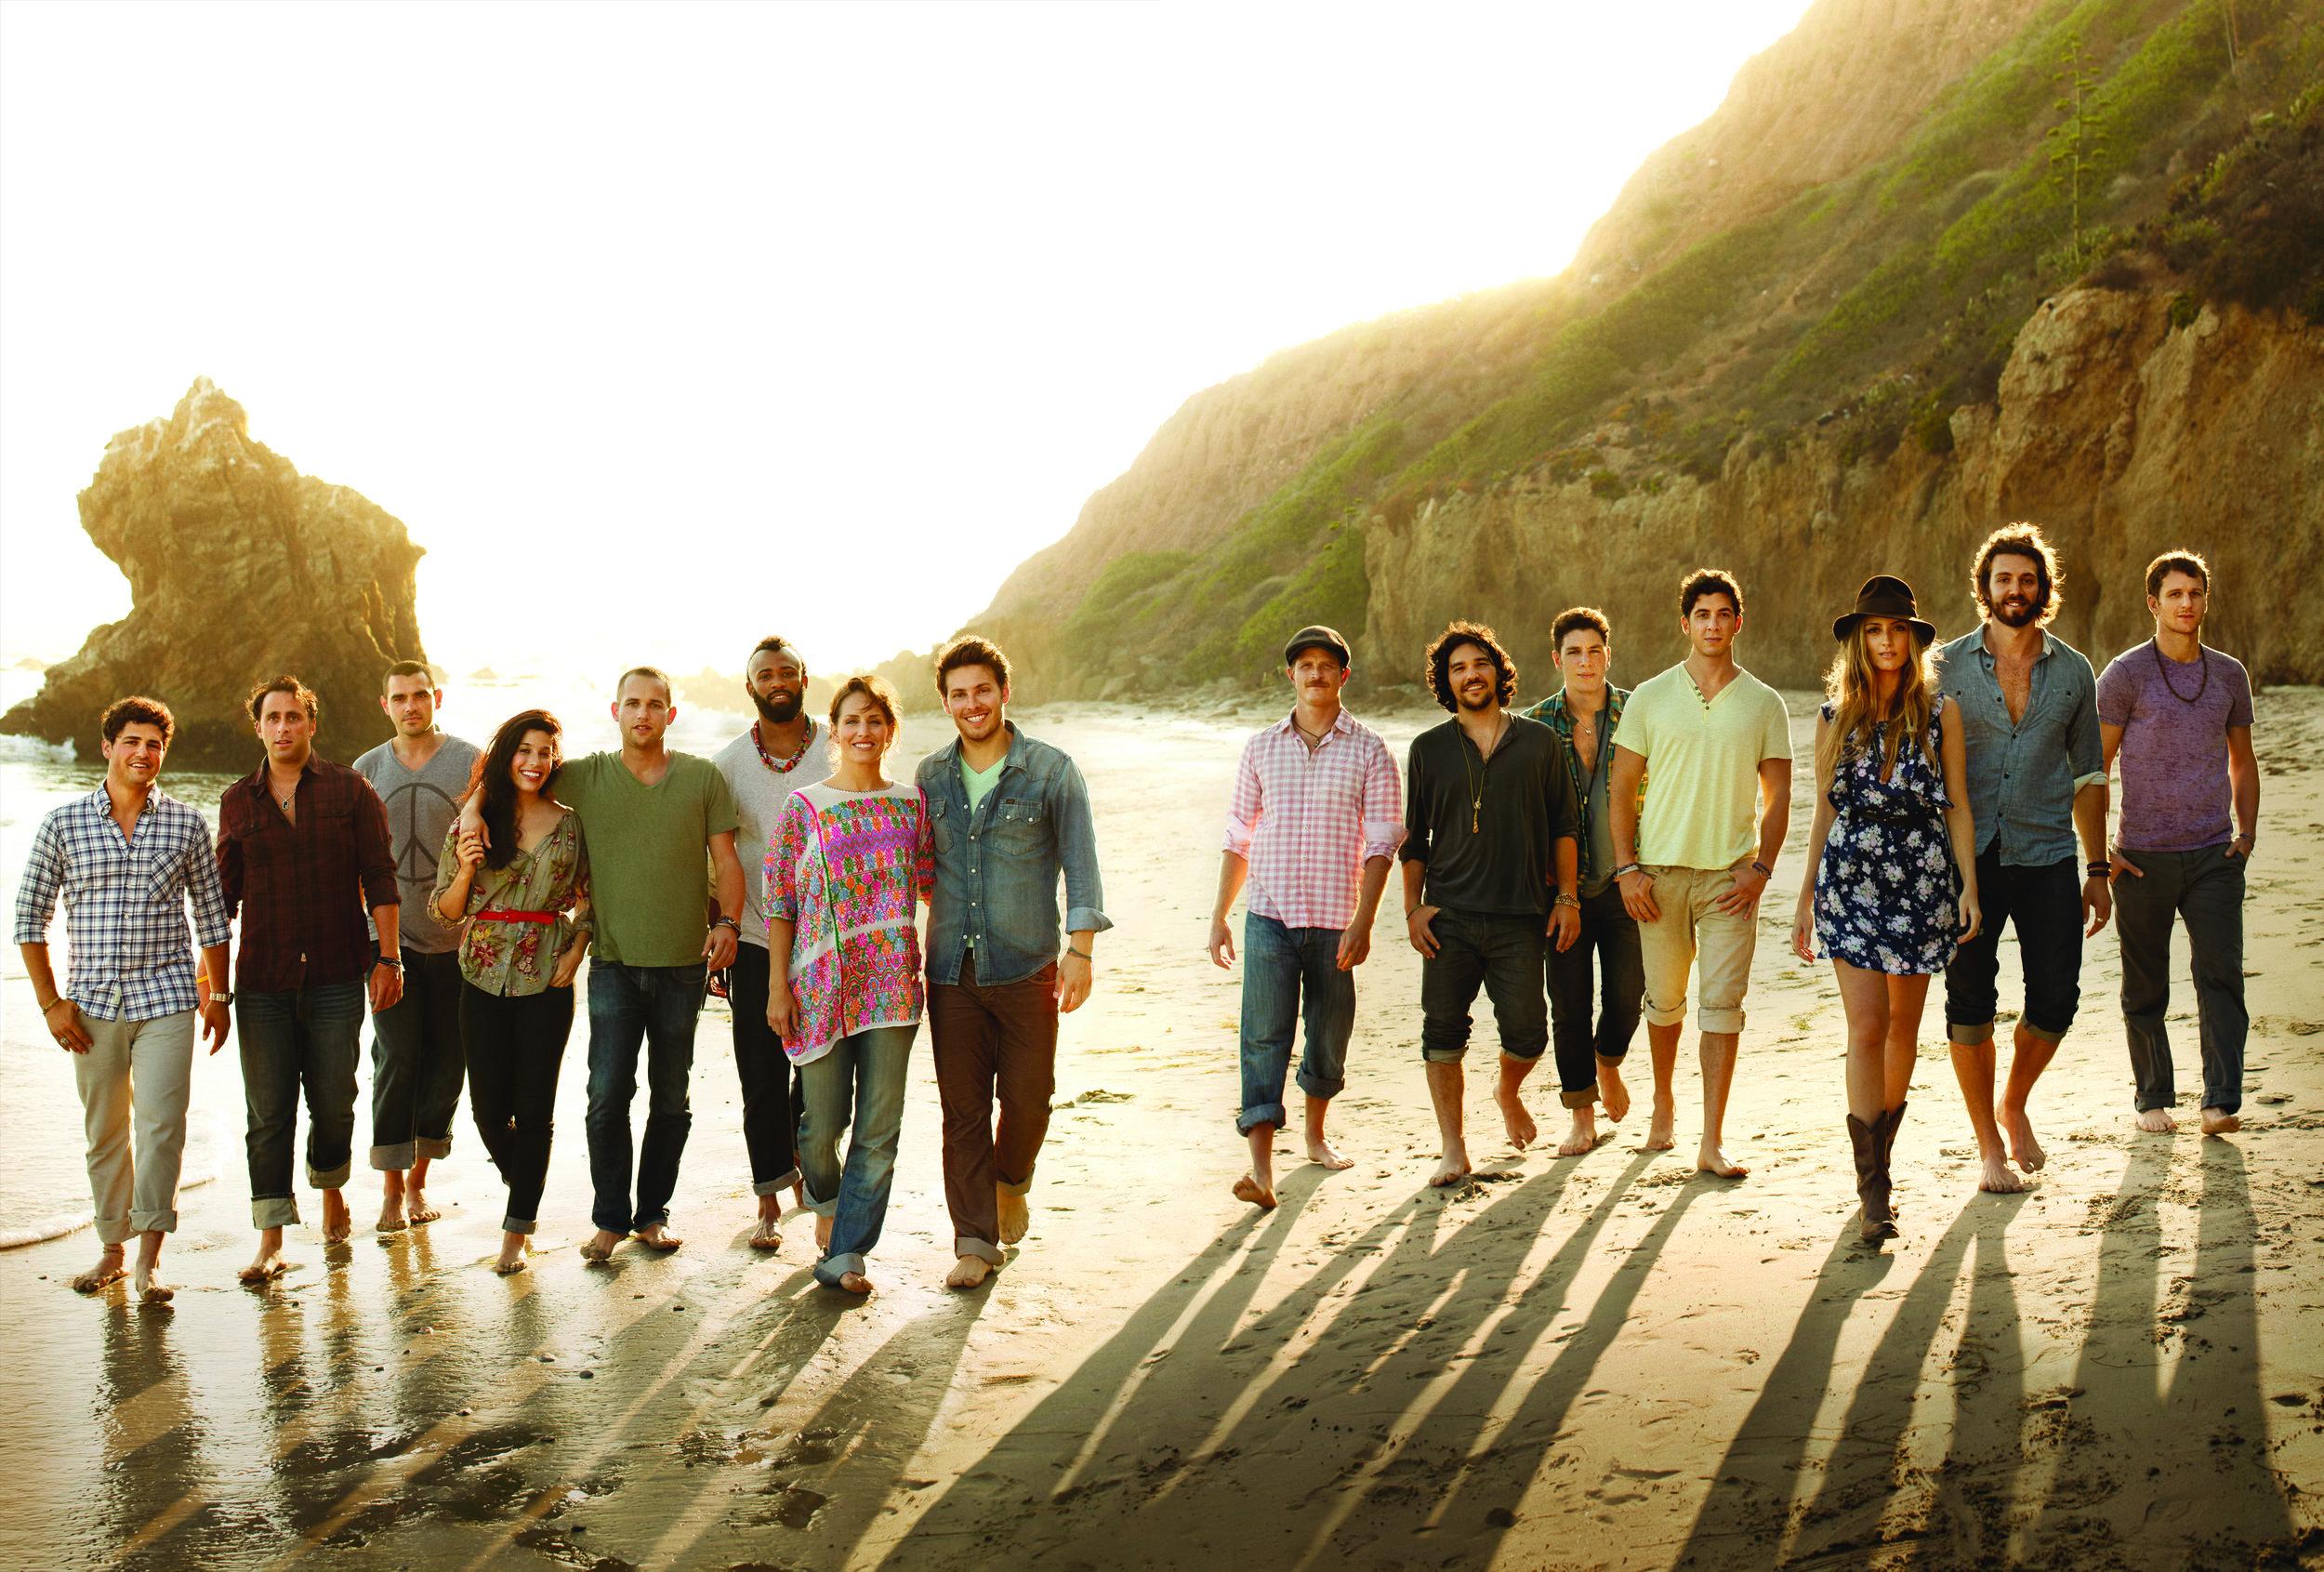 Summit  Team in Malibu, California (September 2011 Issue) /Photo Courtesy:   Vanity Fair